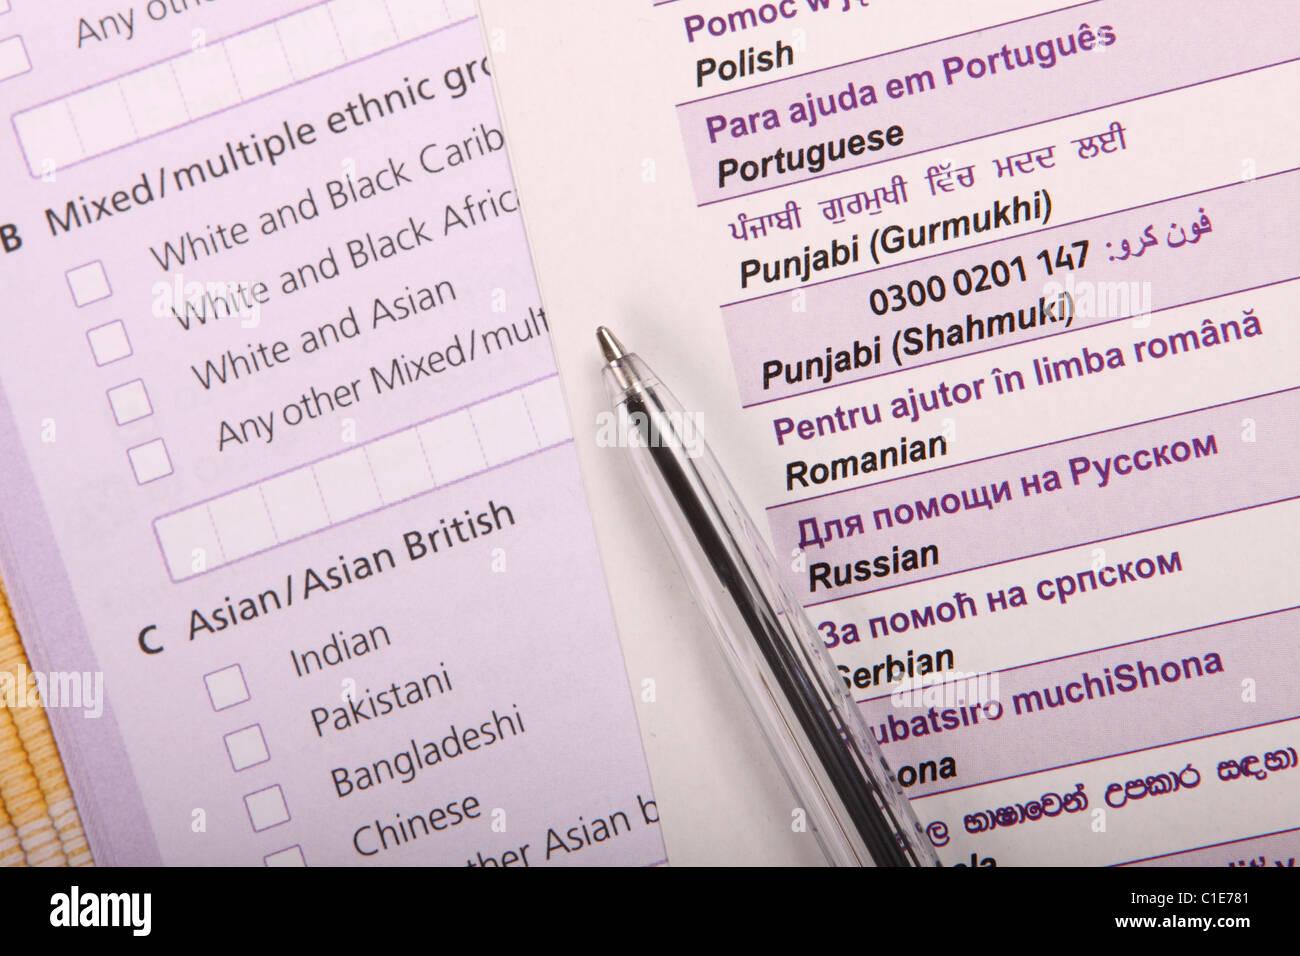 Census 2011 multi language lingual translation services document - Stock Image